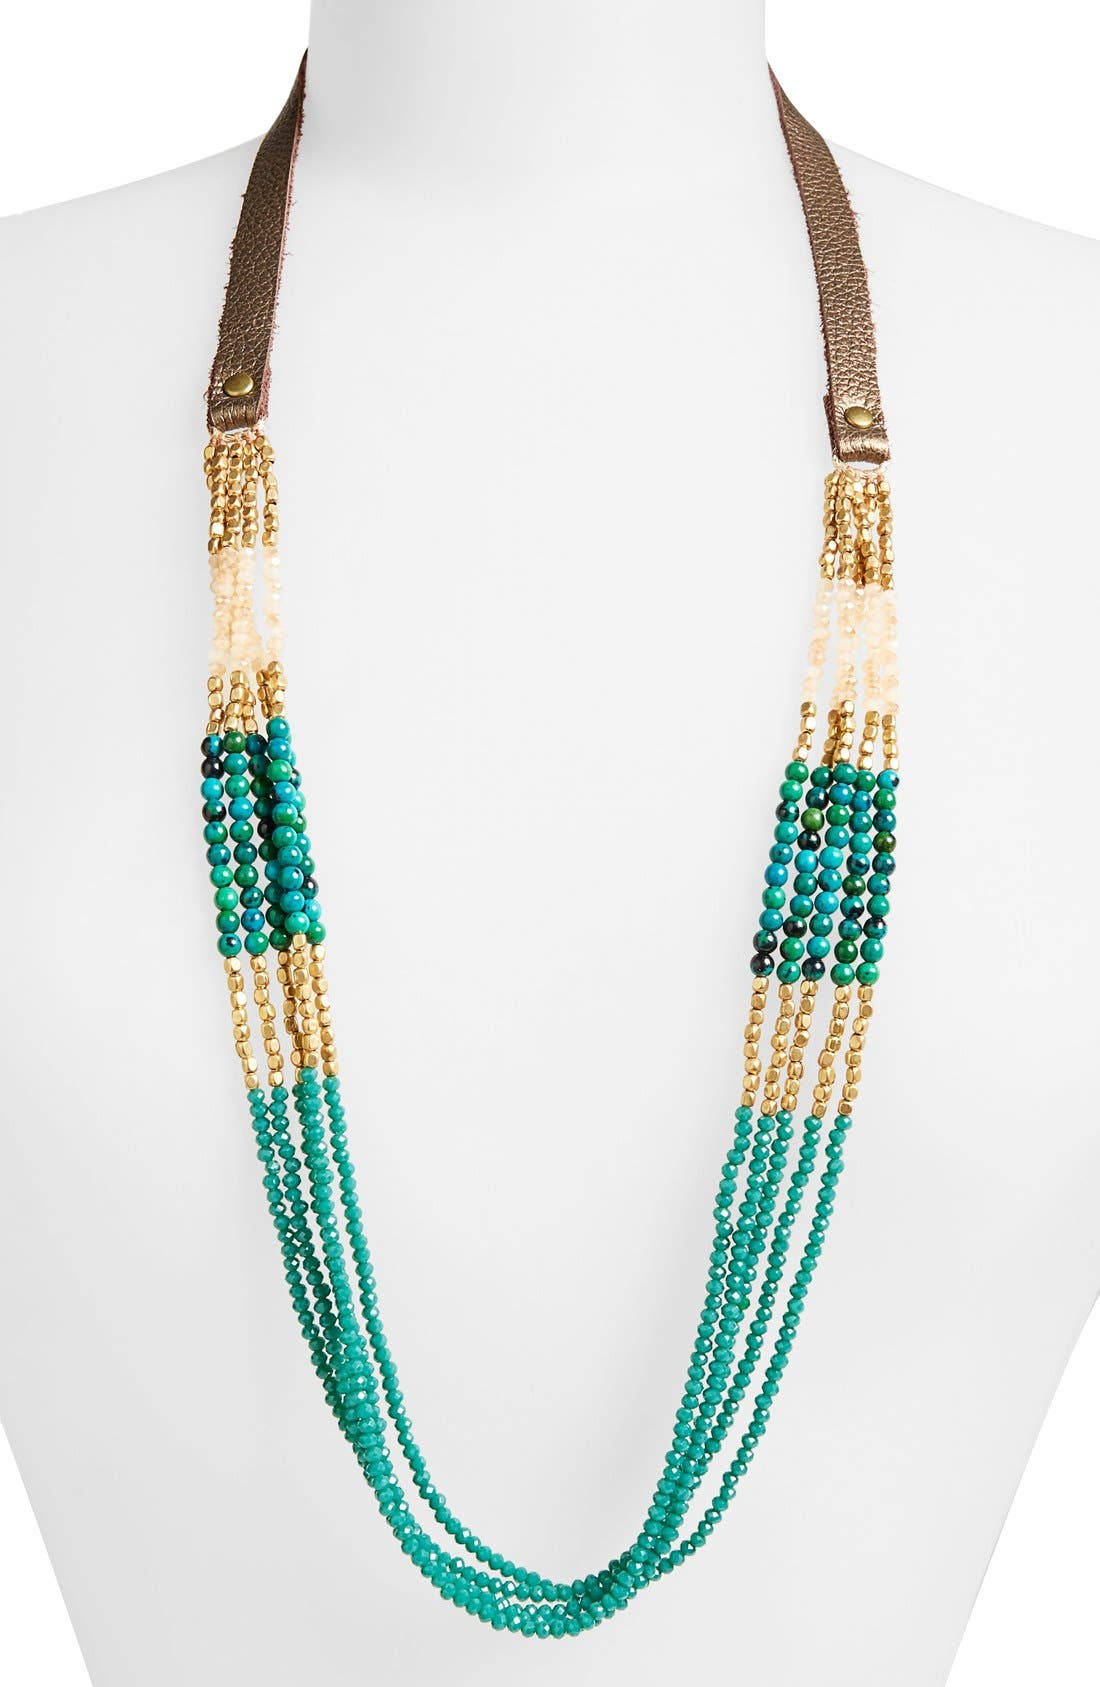 Main Image - Panacea Crystal & Stone Multistrand Necklace